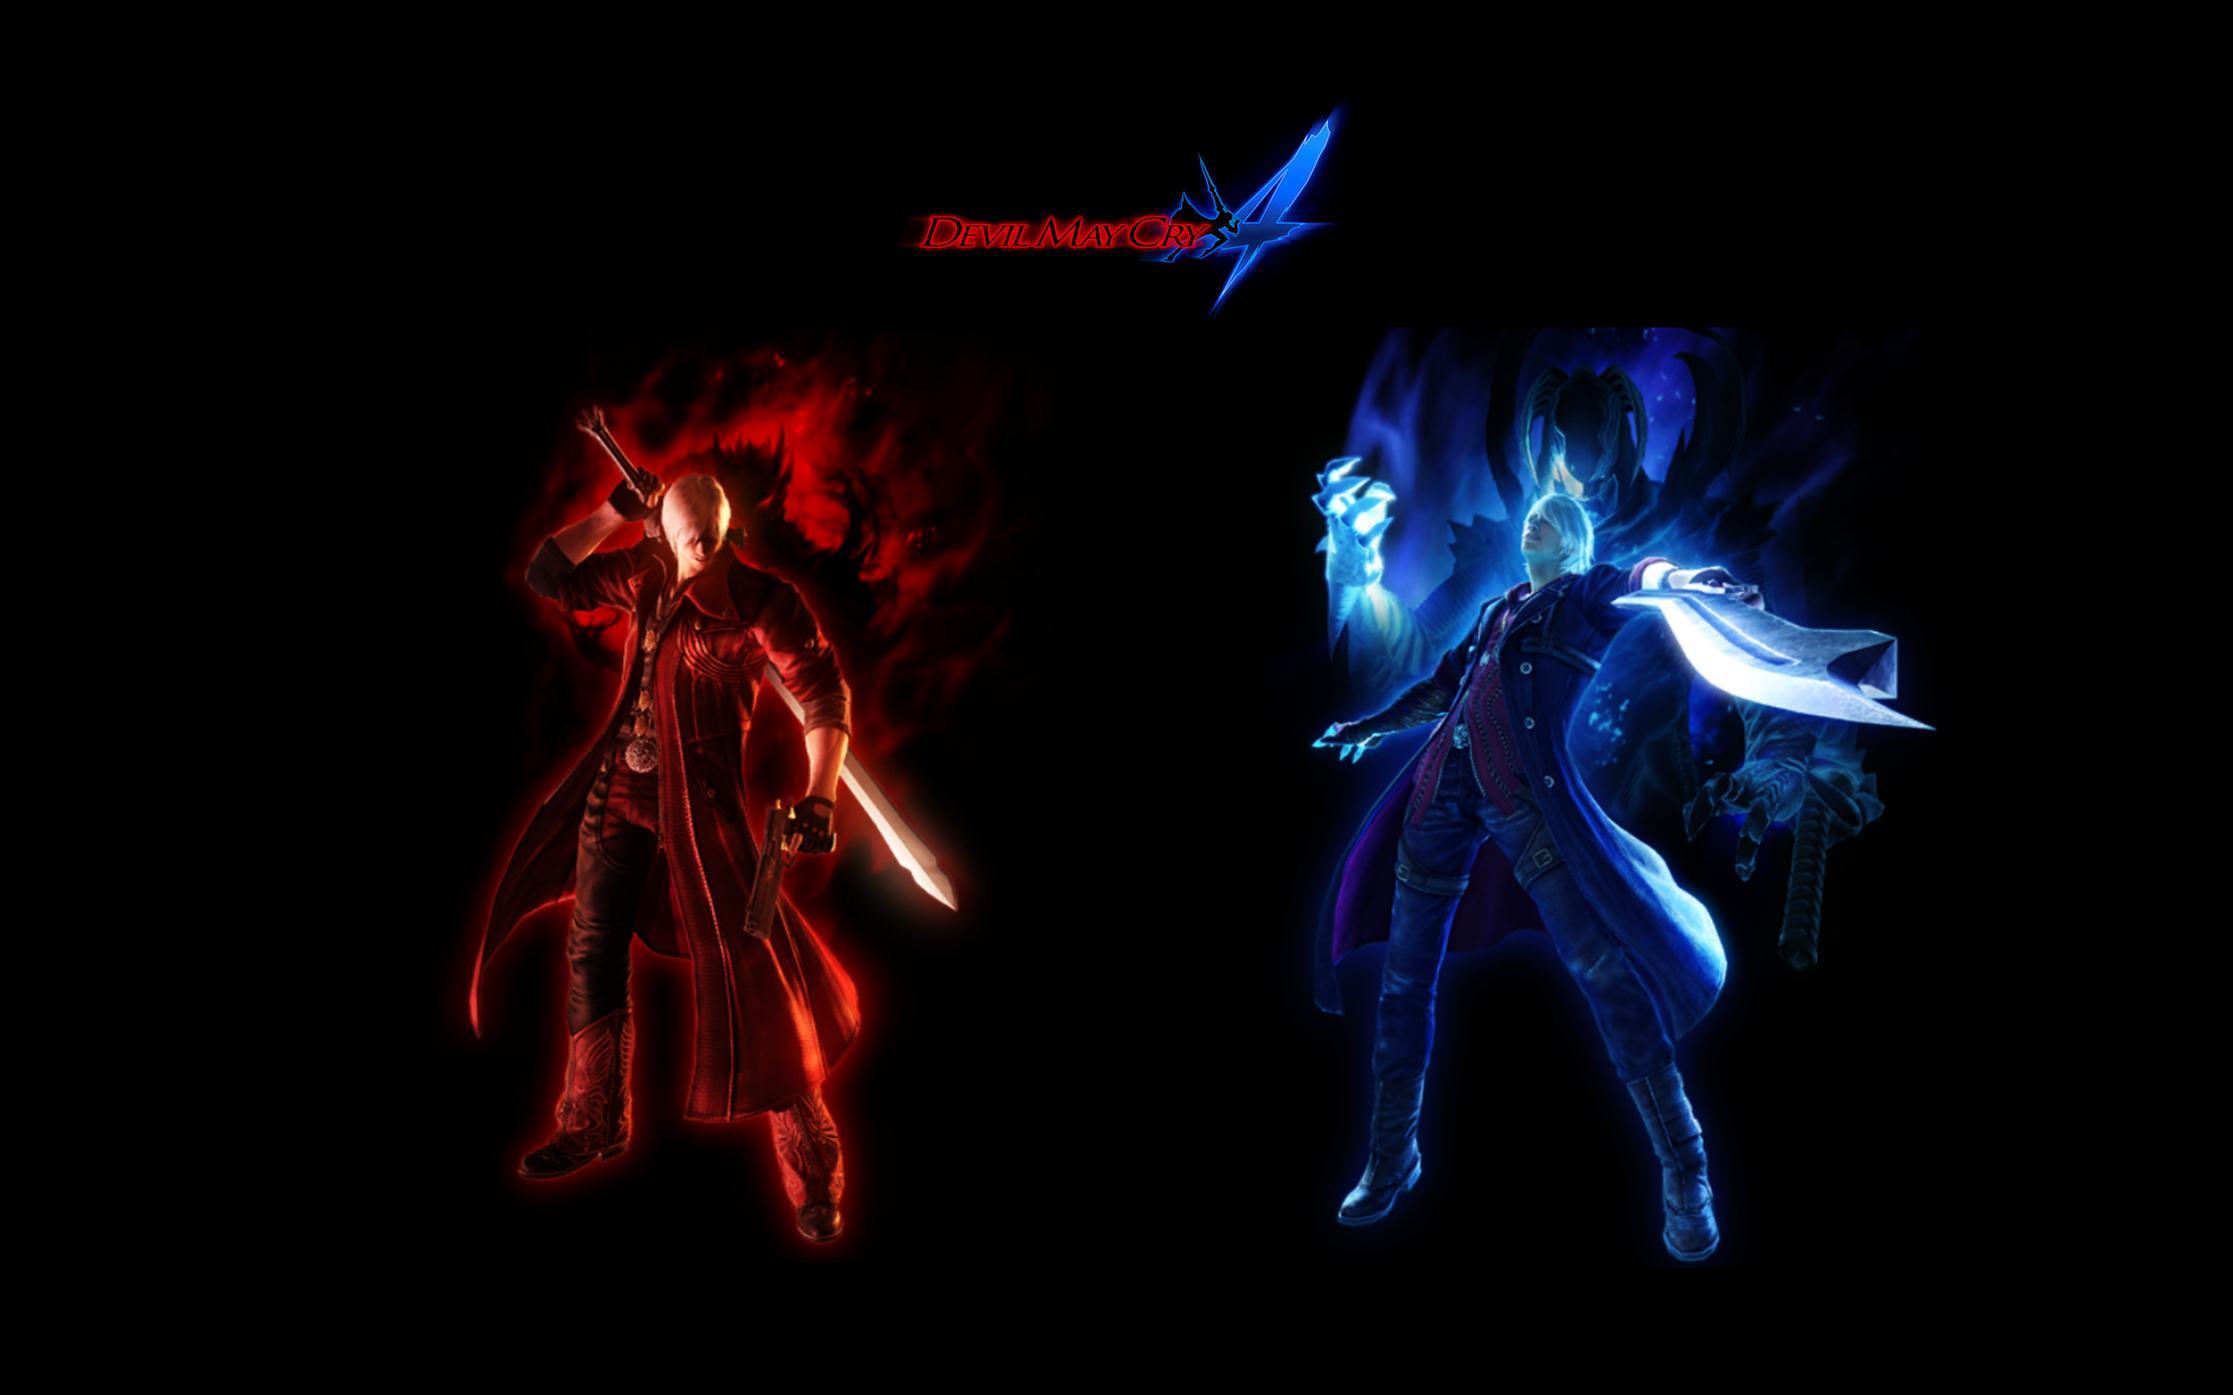 Devil May Cry 4 Dante and Nero by TrogdorTehBurninator on DeviantArt